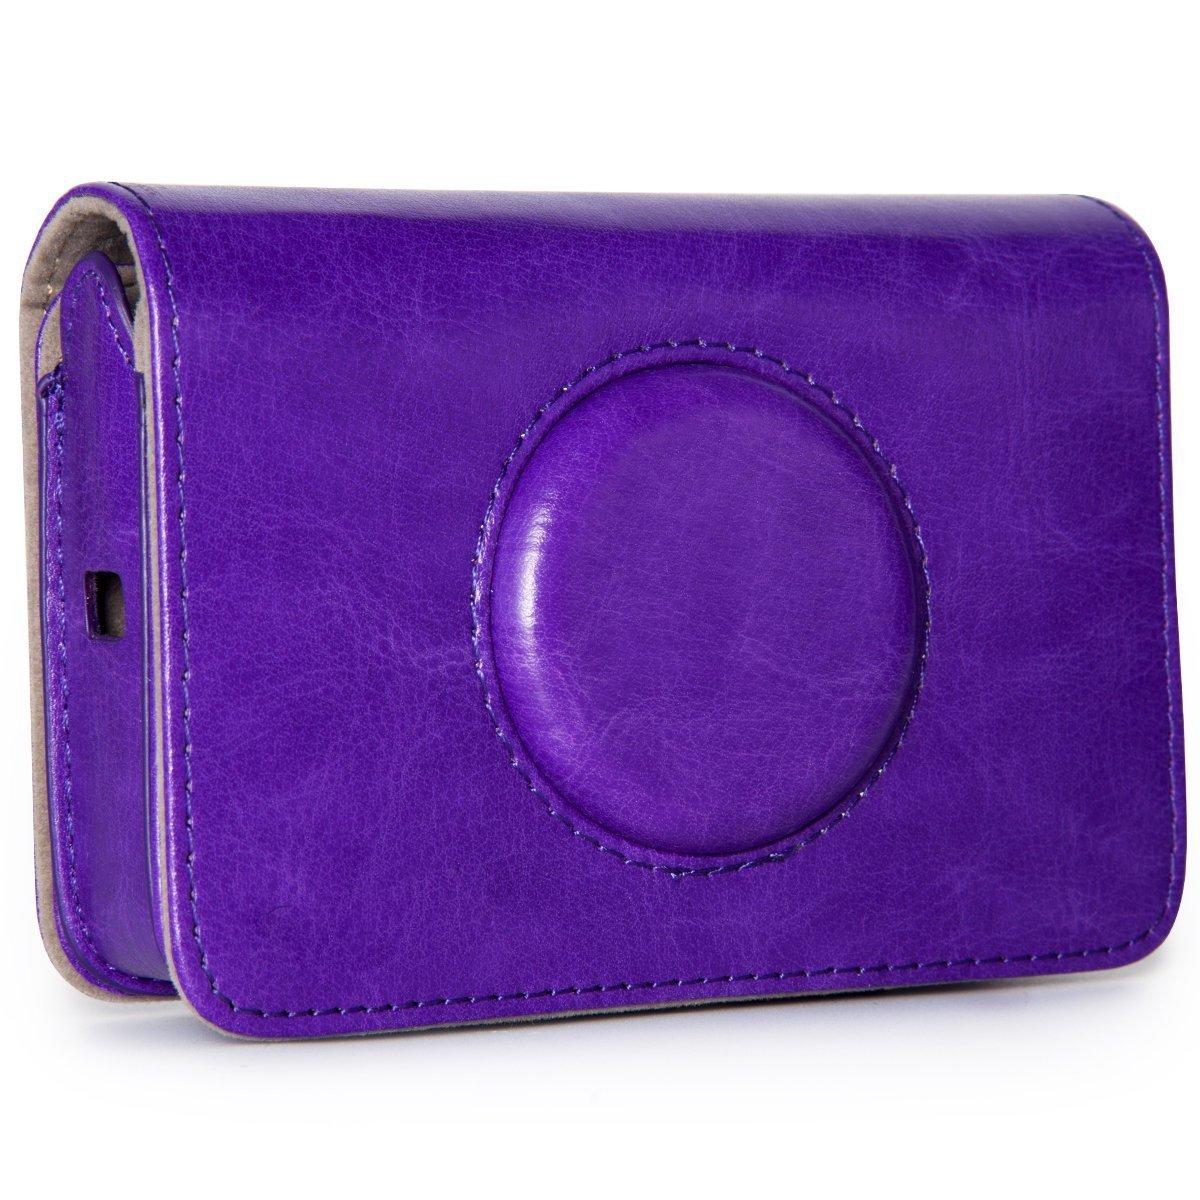 taiyaun cá mara accesorio para Polaroid cá mara Digital de impresió n instantá nea Snap Touch en sinté tica TYC066-purple-1